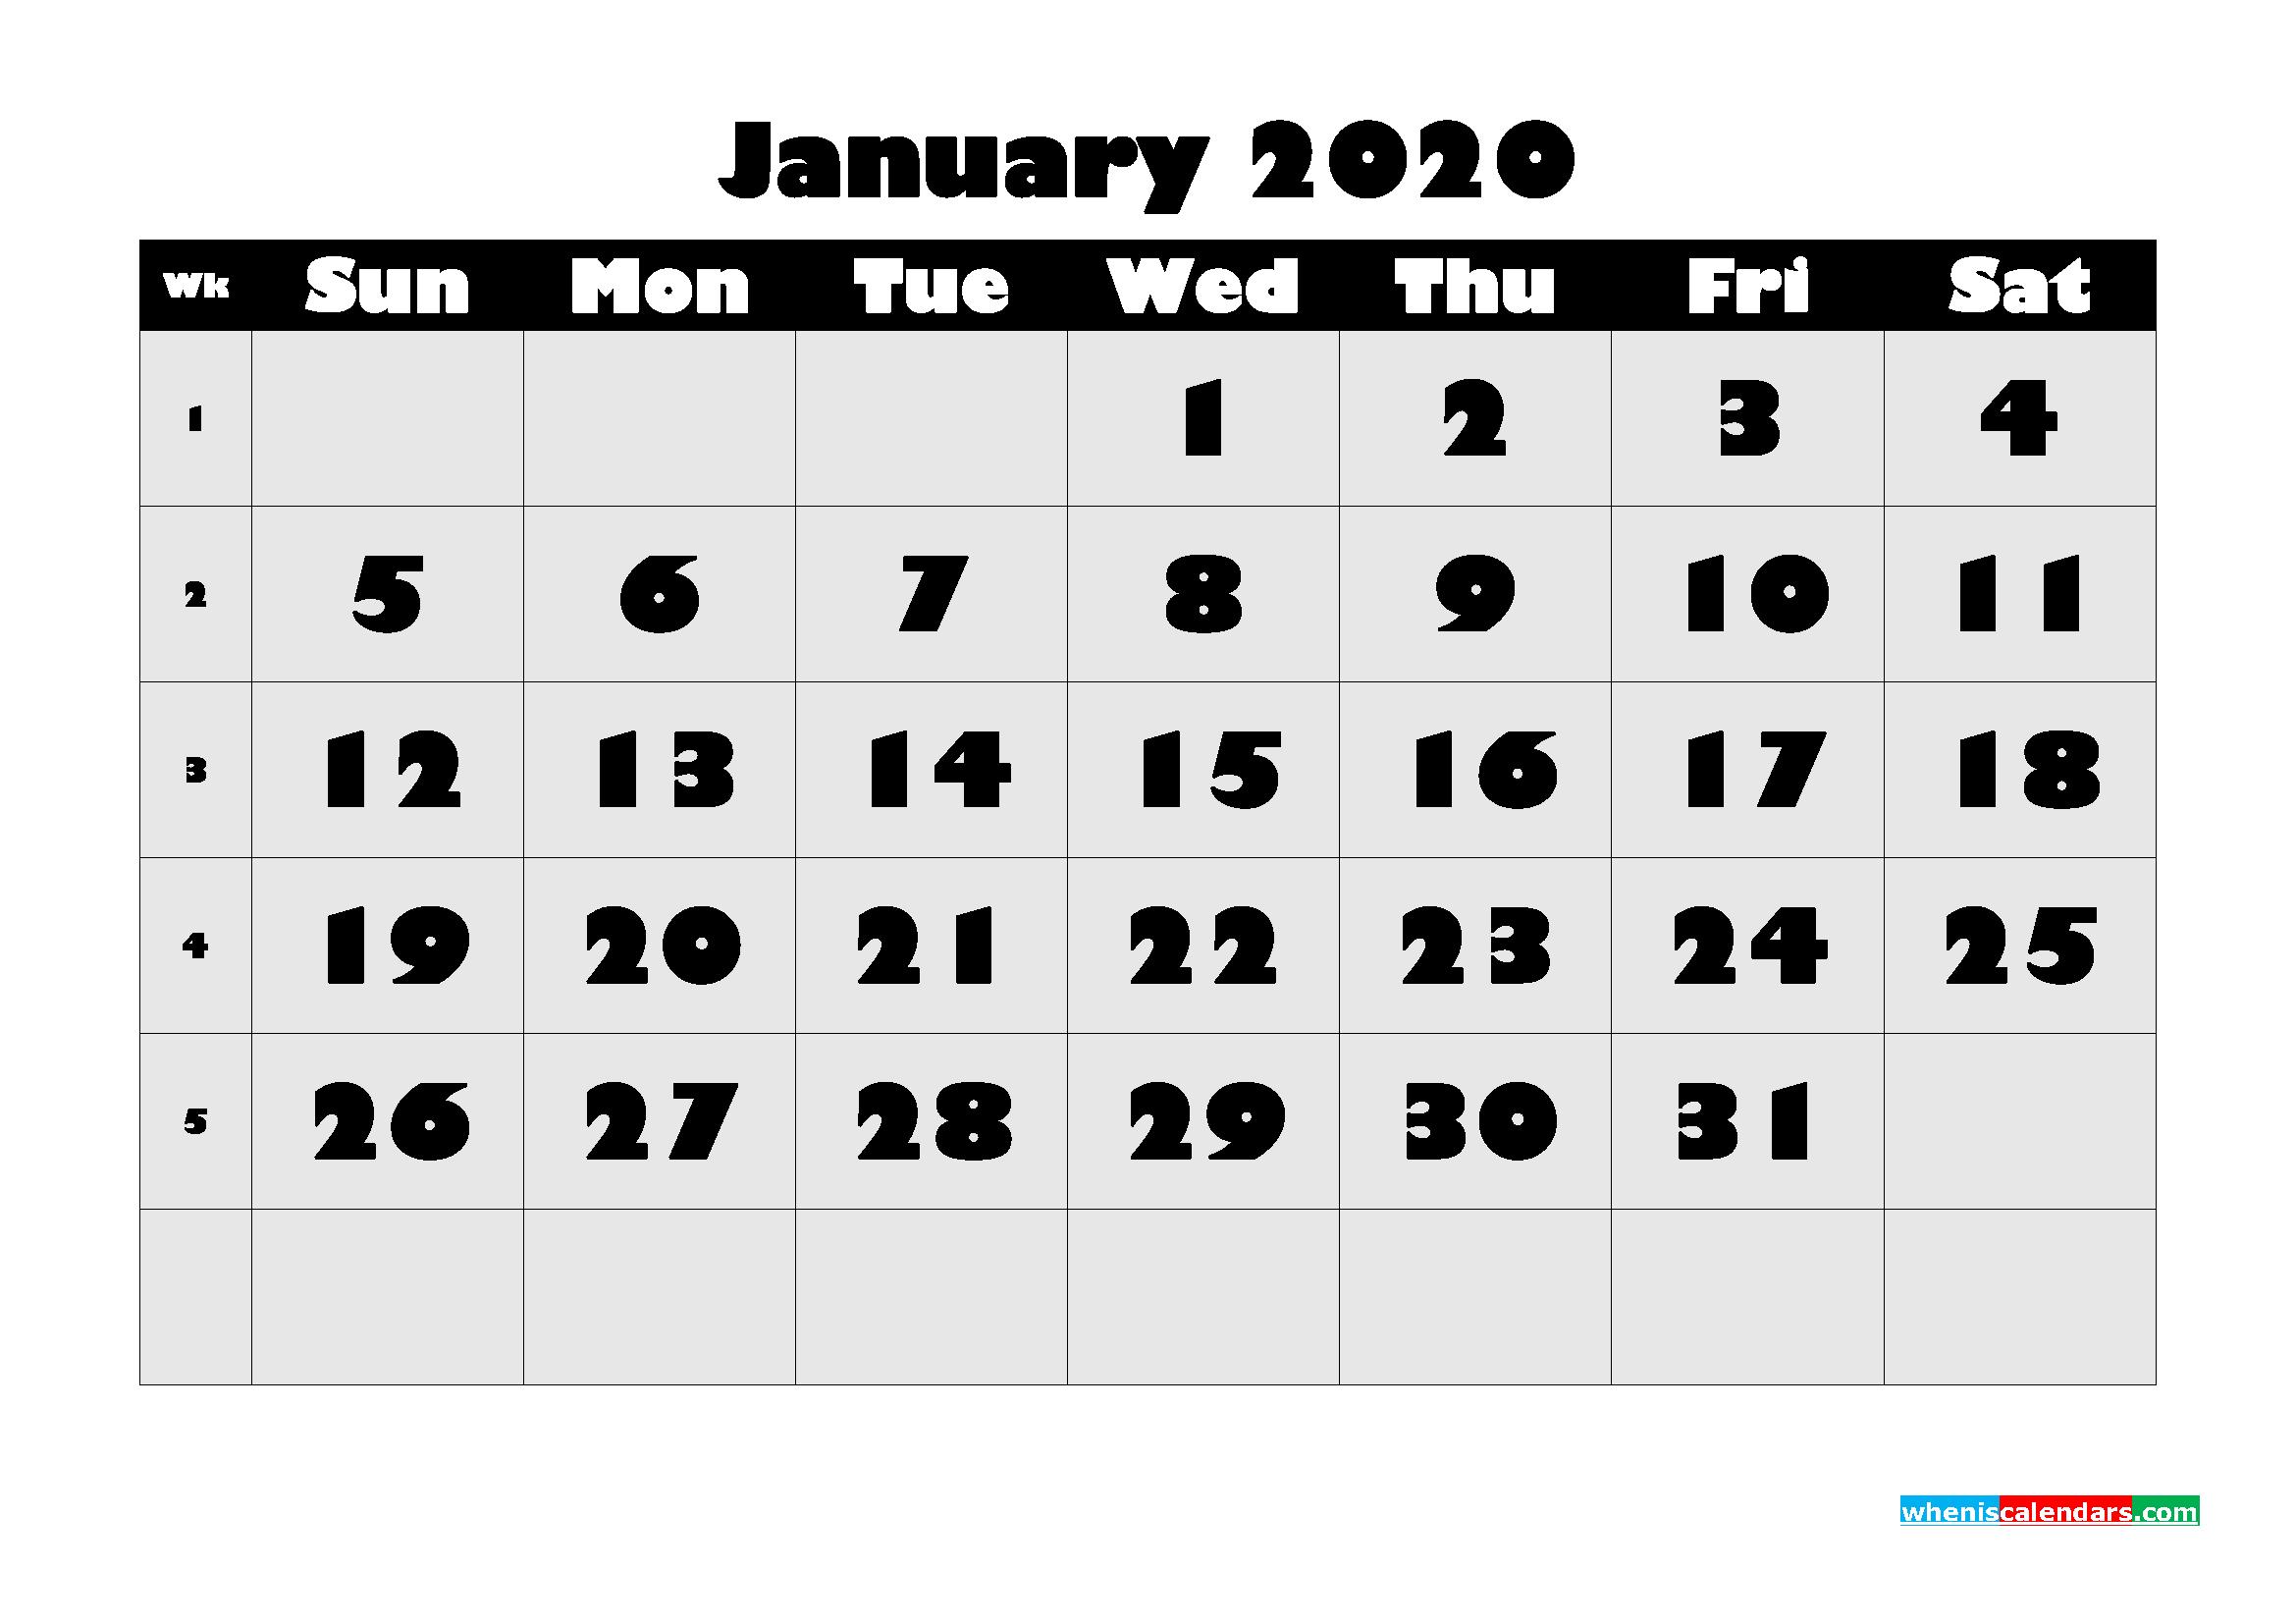 Free Printable January 2020 Calendar - No.m20b601